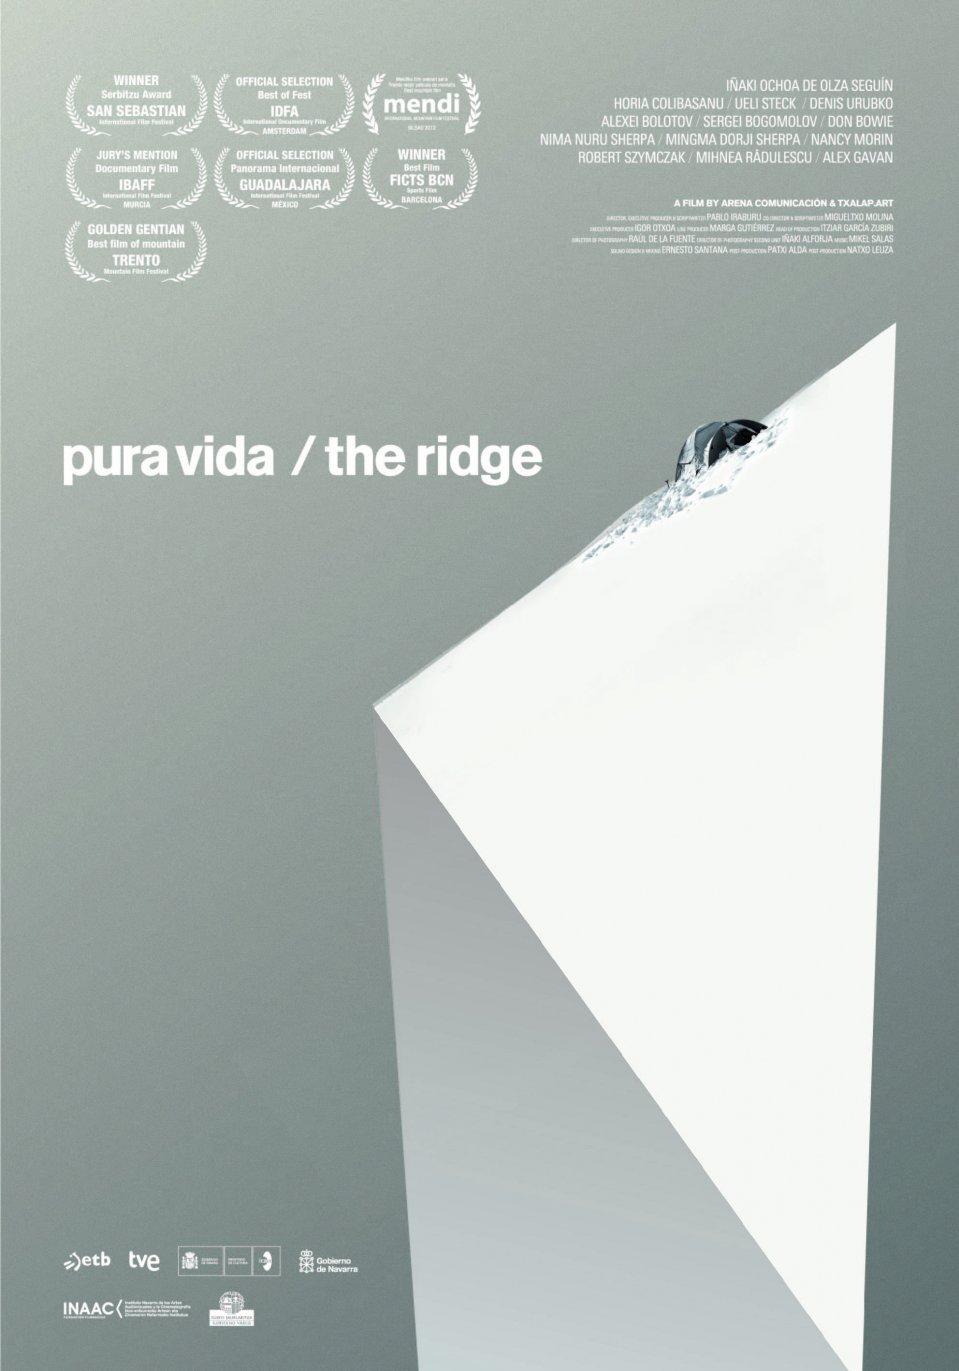 PURA VIDA / THE RIDGE